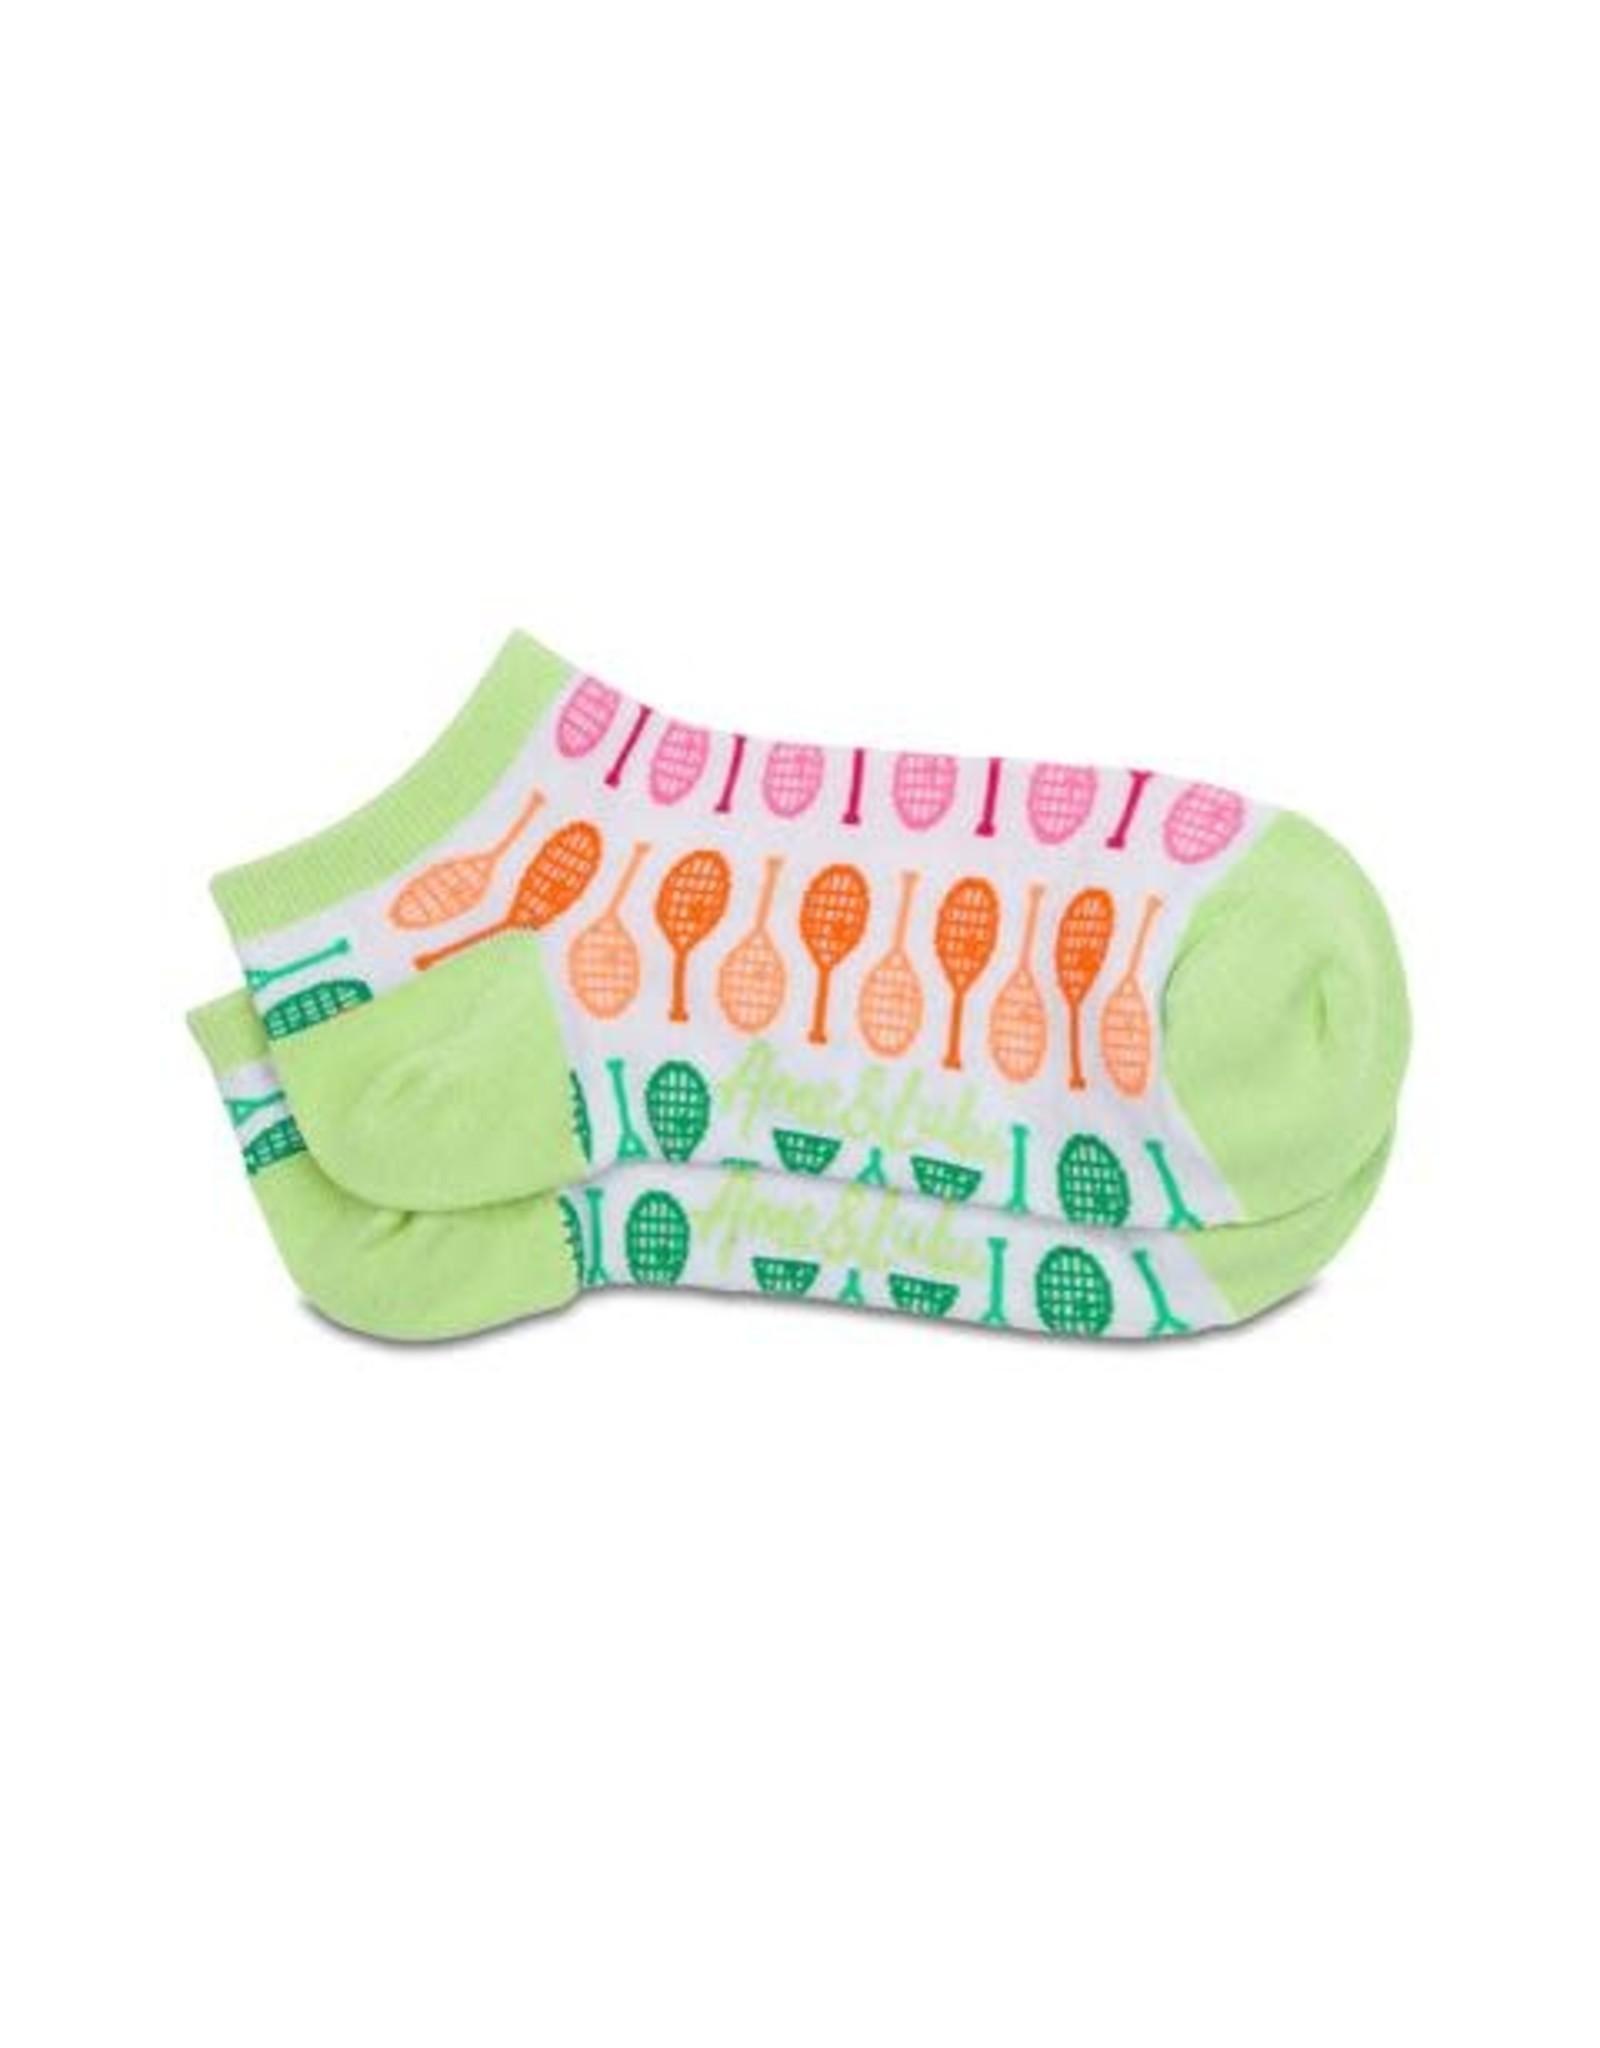 Ame & Lulu Meet Your Match Socks